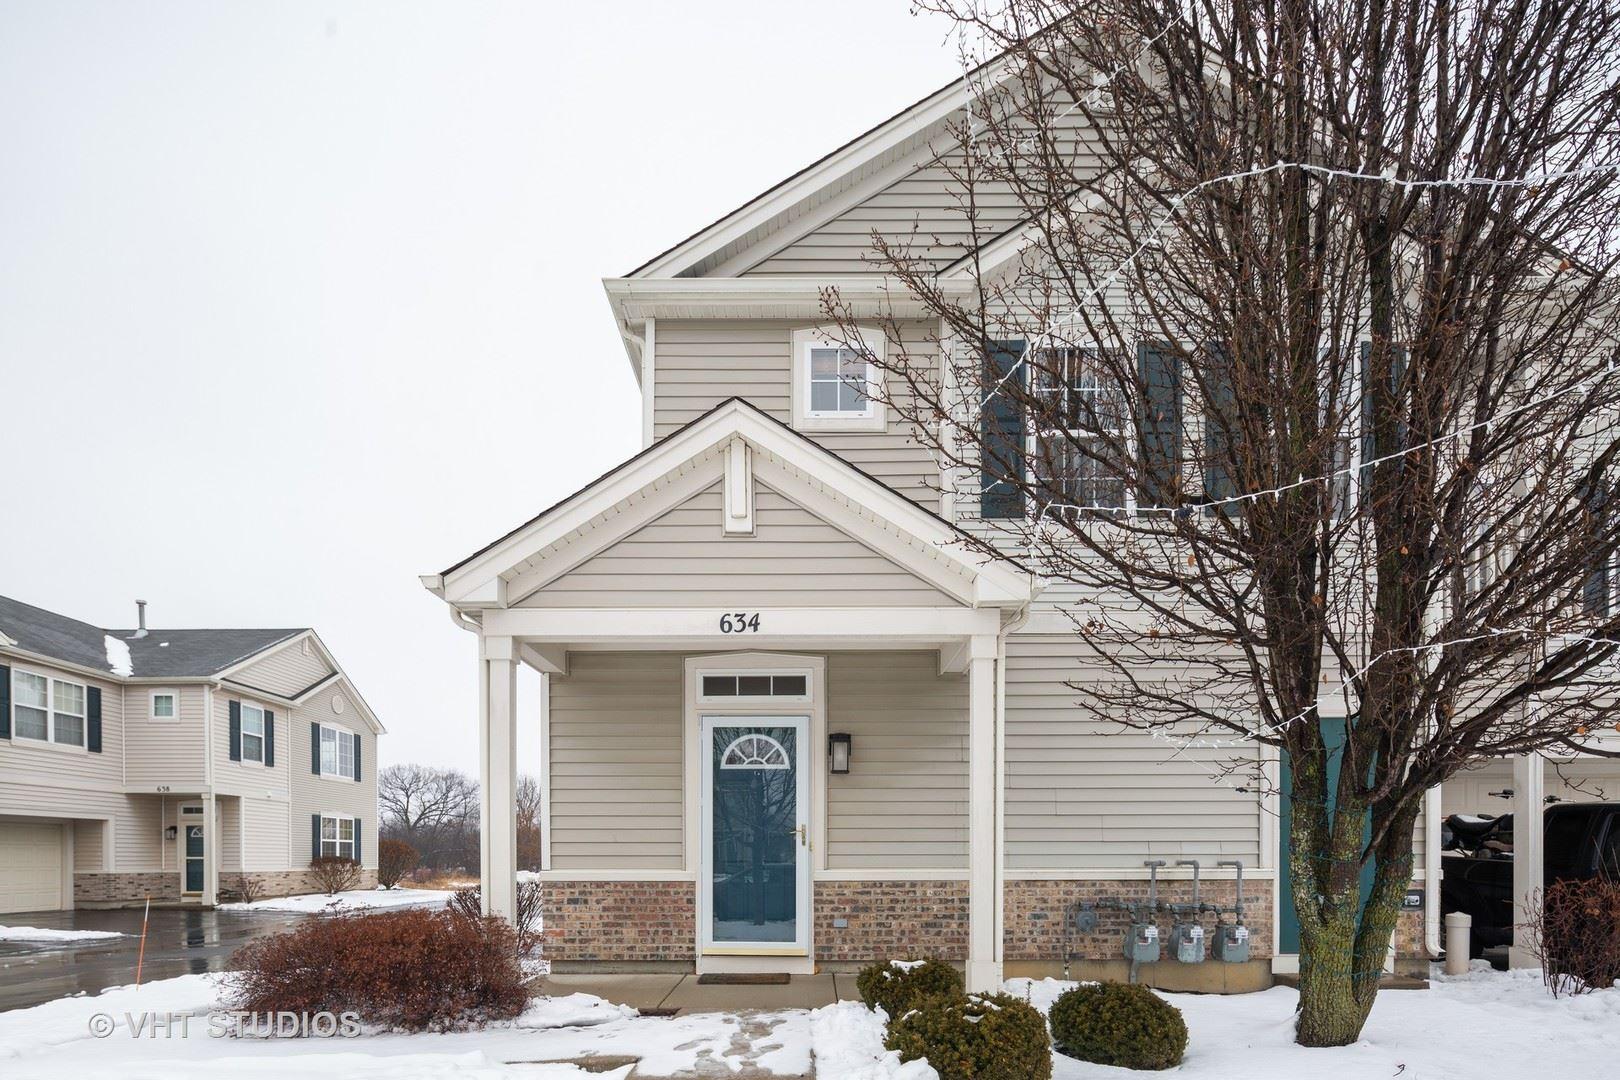 634 Arbor Circle #634, Lakemoor, IL 60051 - #: 10614621